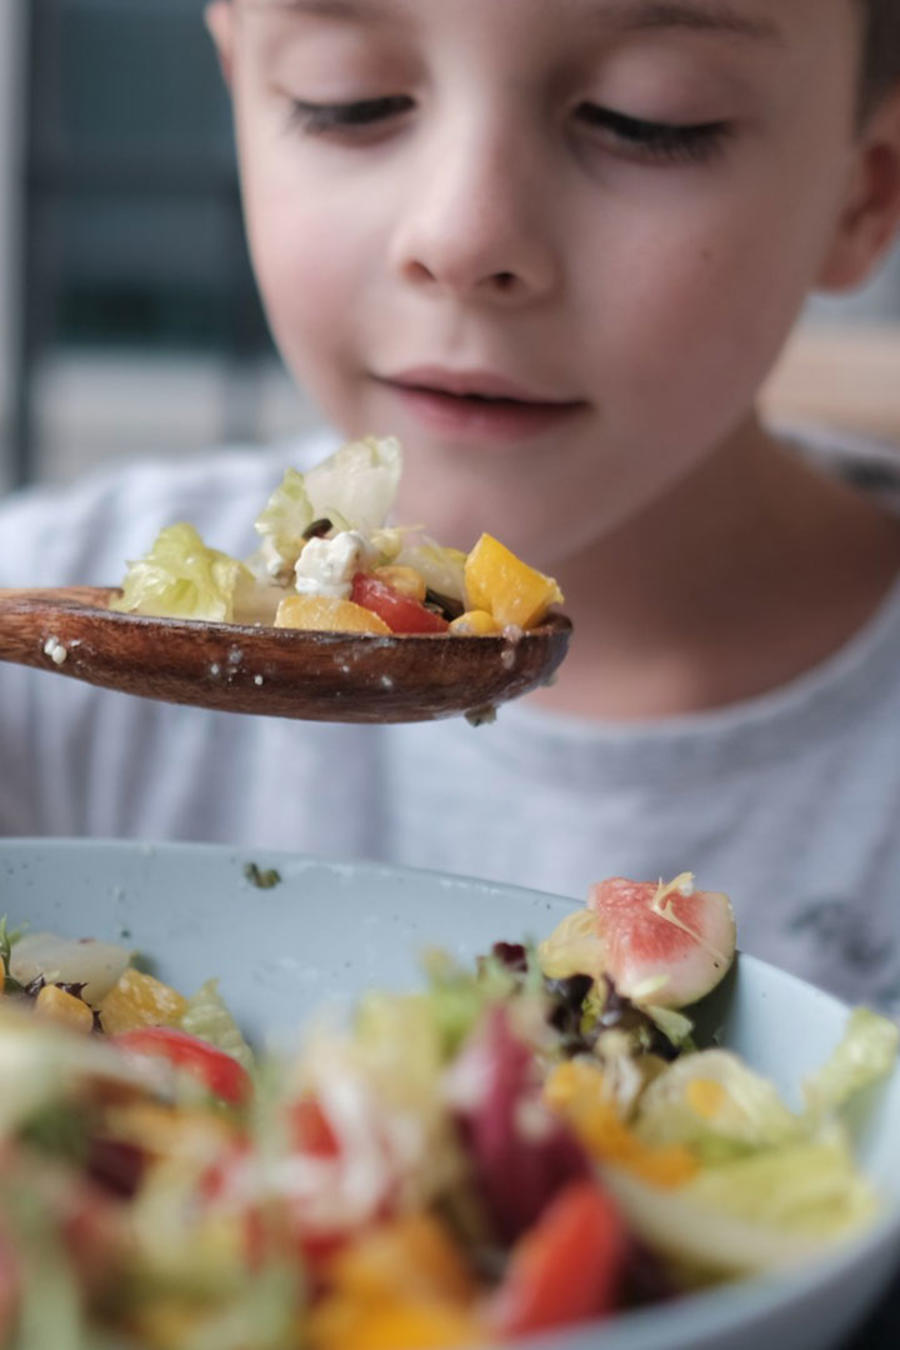 Niño comiendo ensalada